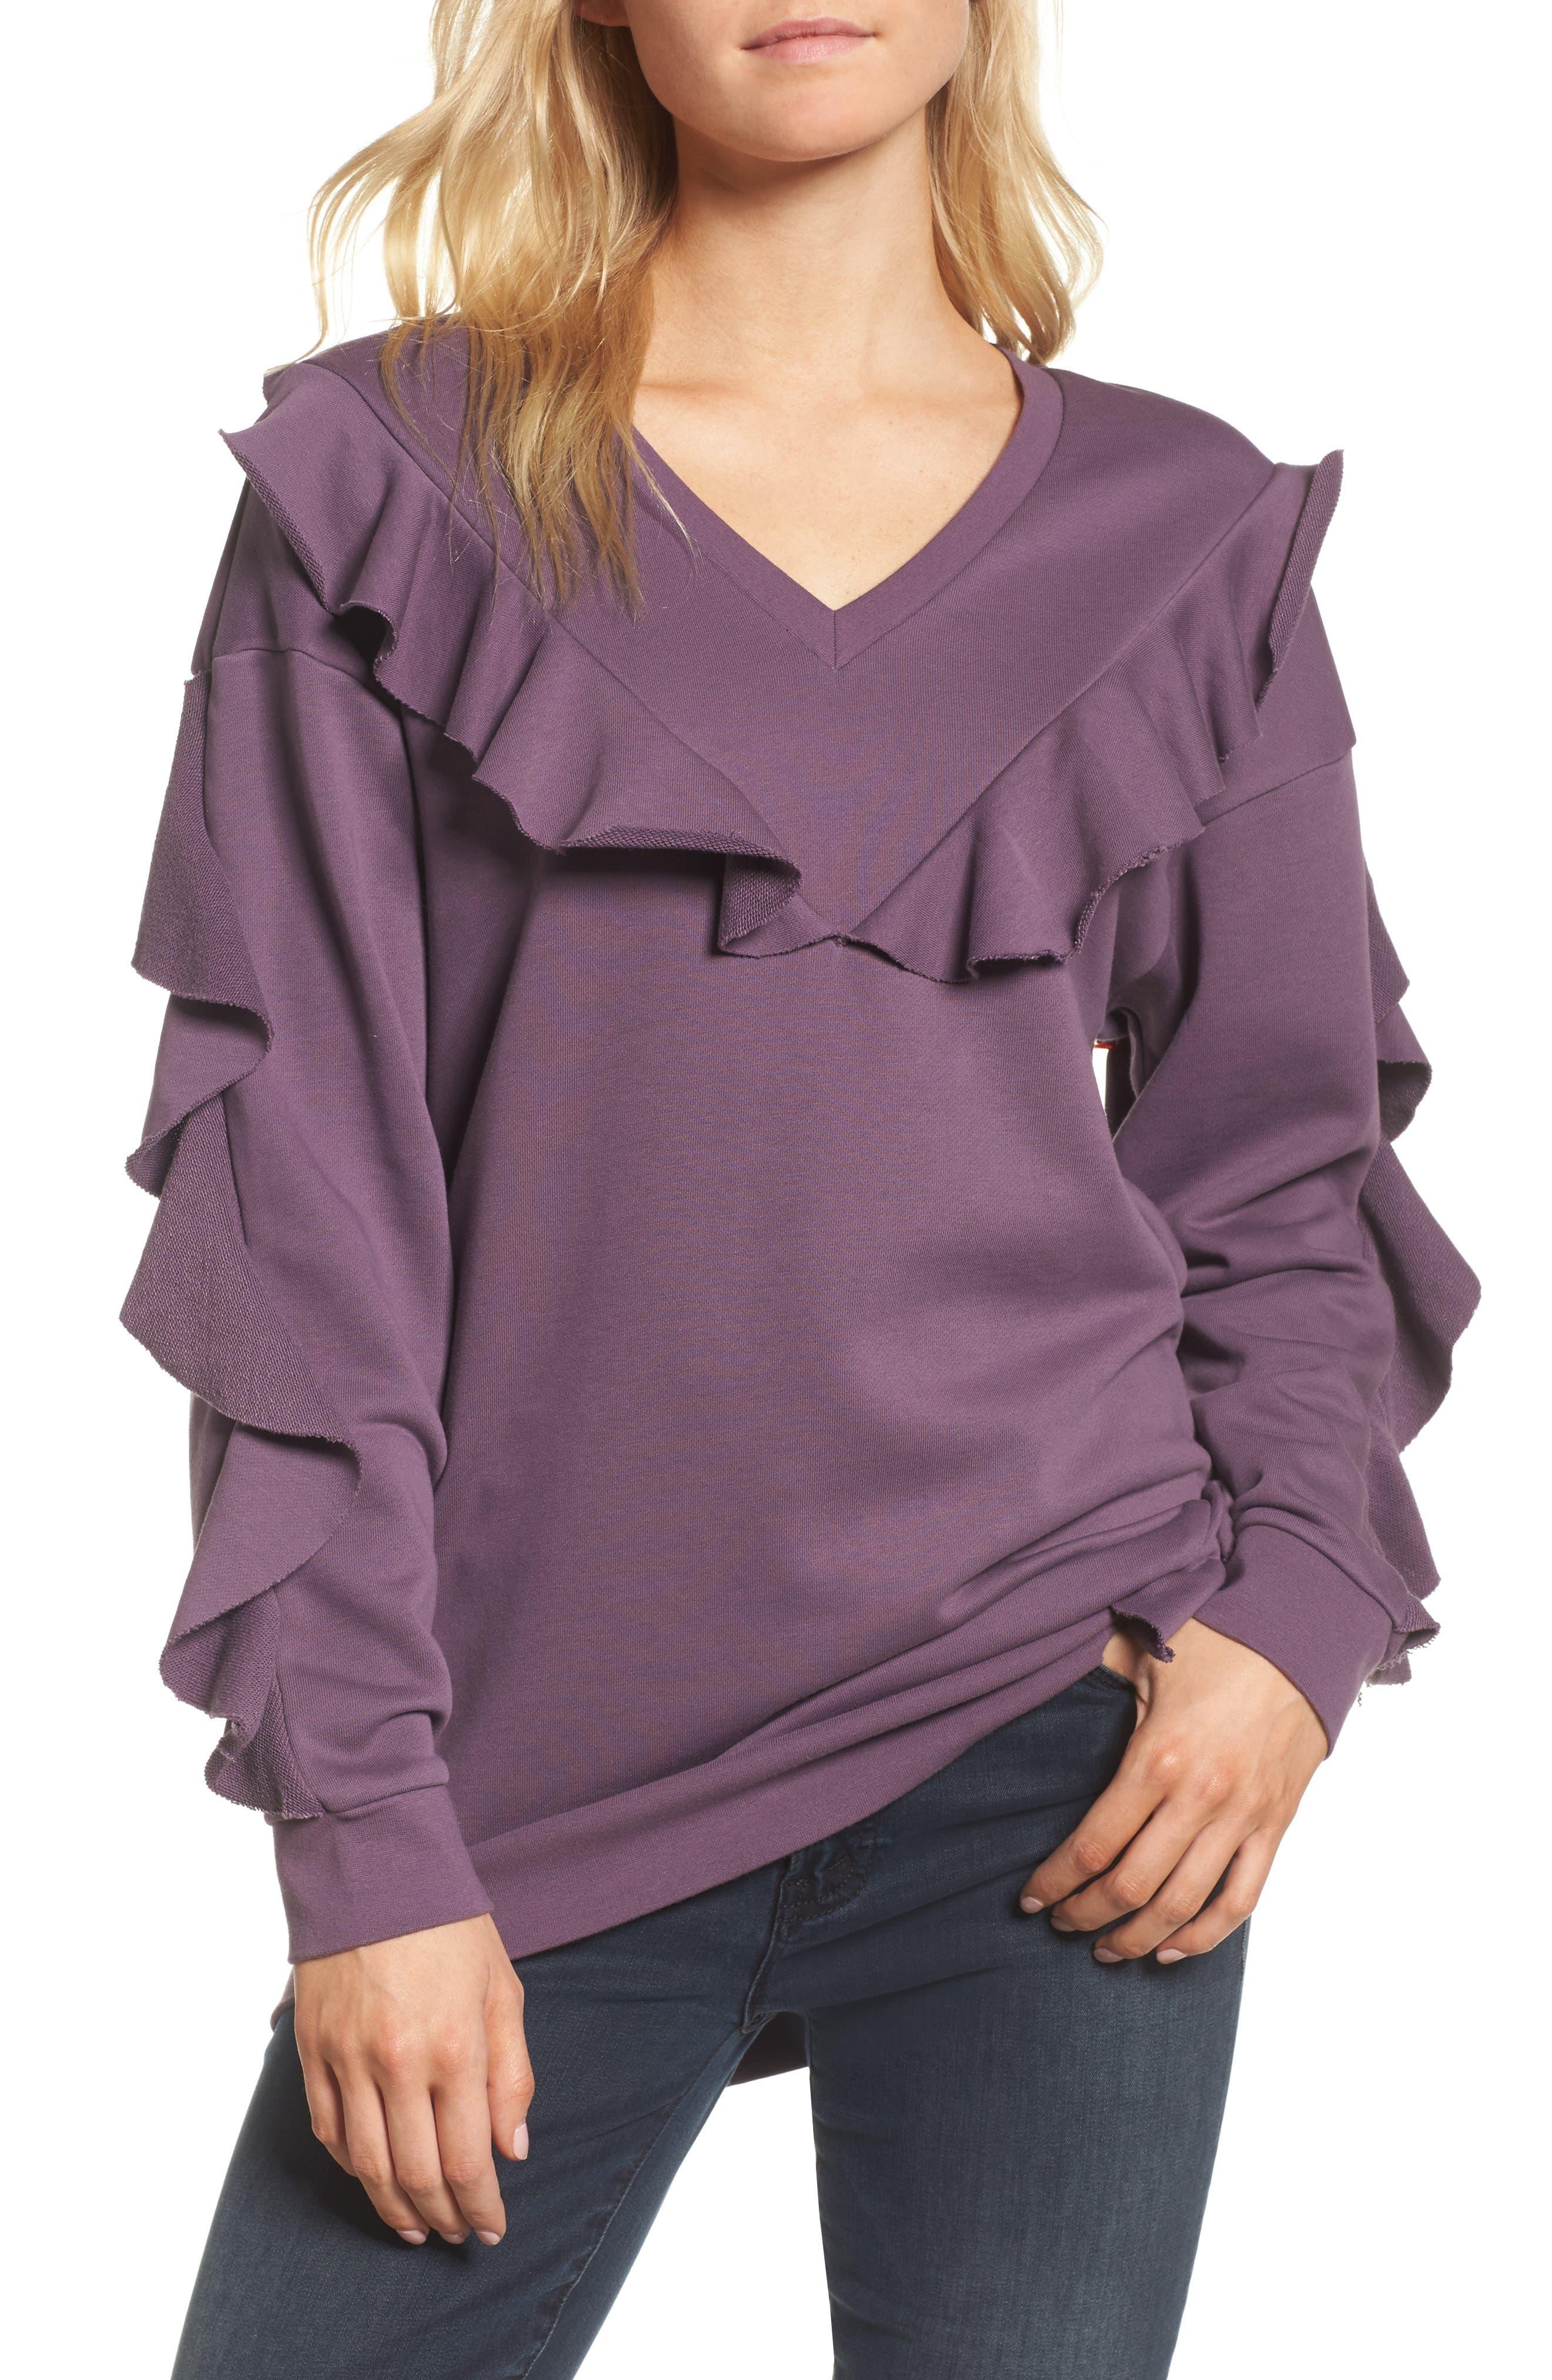 Alternate Image 1 Selected - Chelsea28 Ruffle Sweatshirt